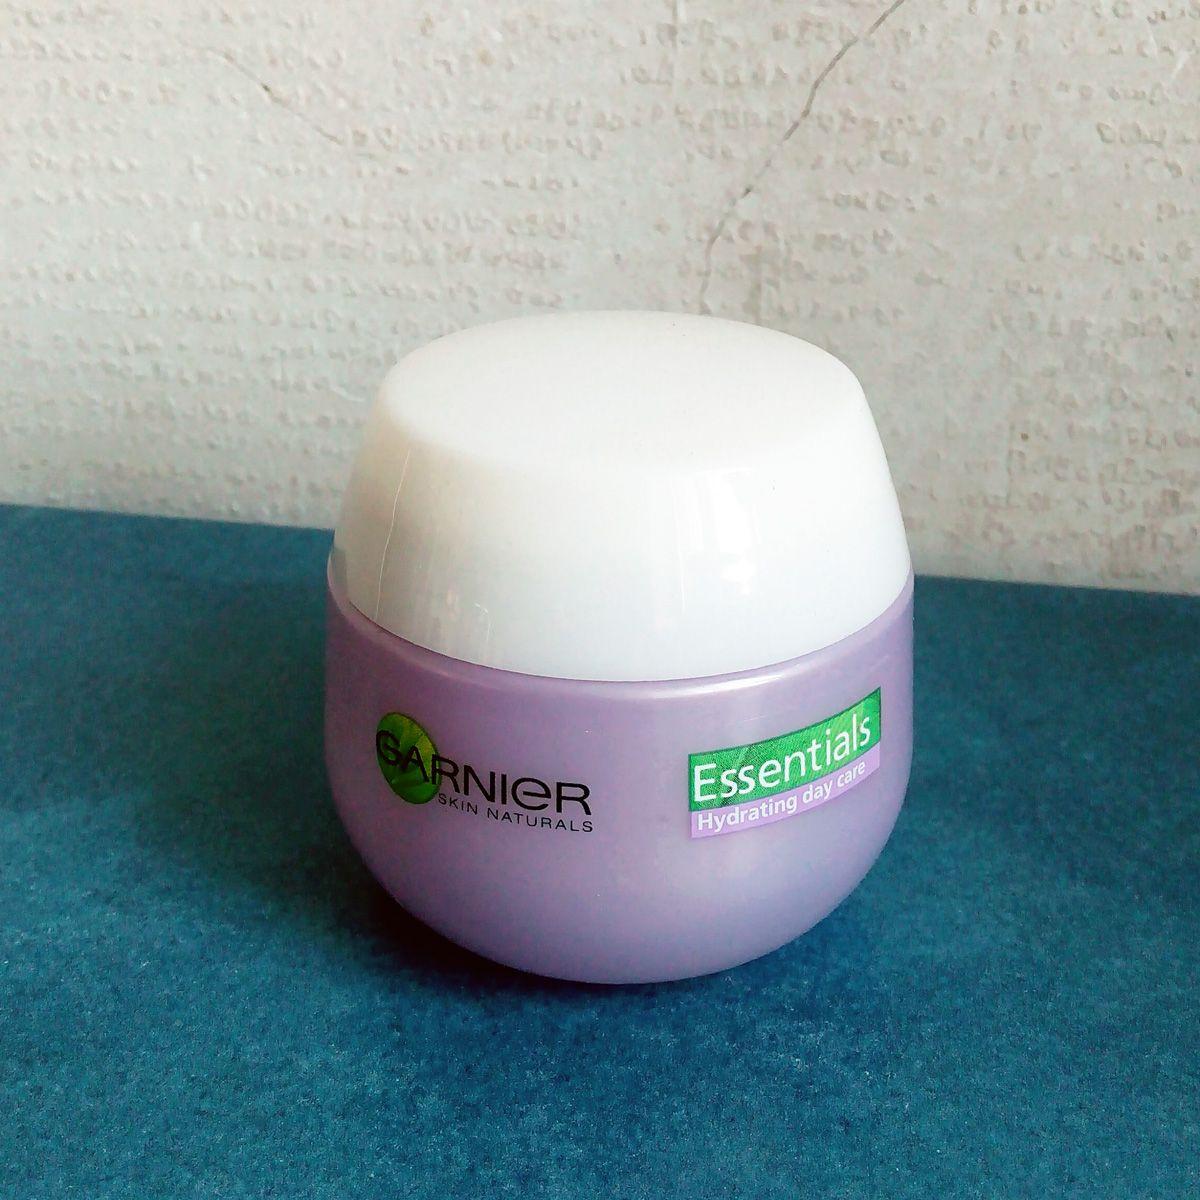 Garnier Essentials Hydrating Day Care For Combination Skin Face Cream Natural Essentials Combination Skin